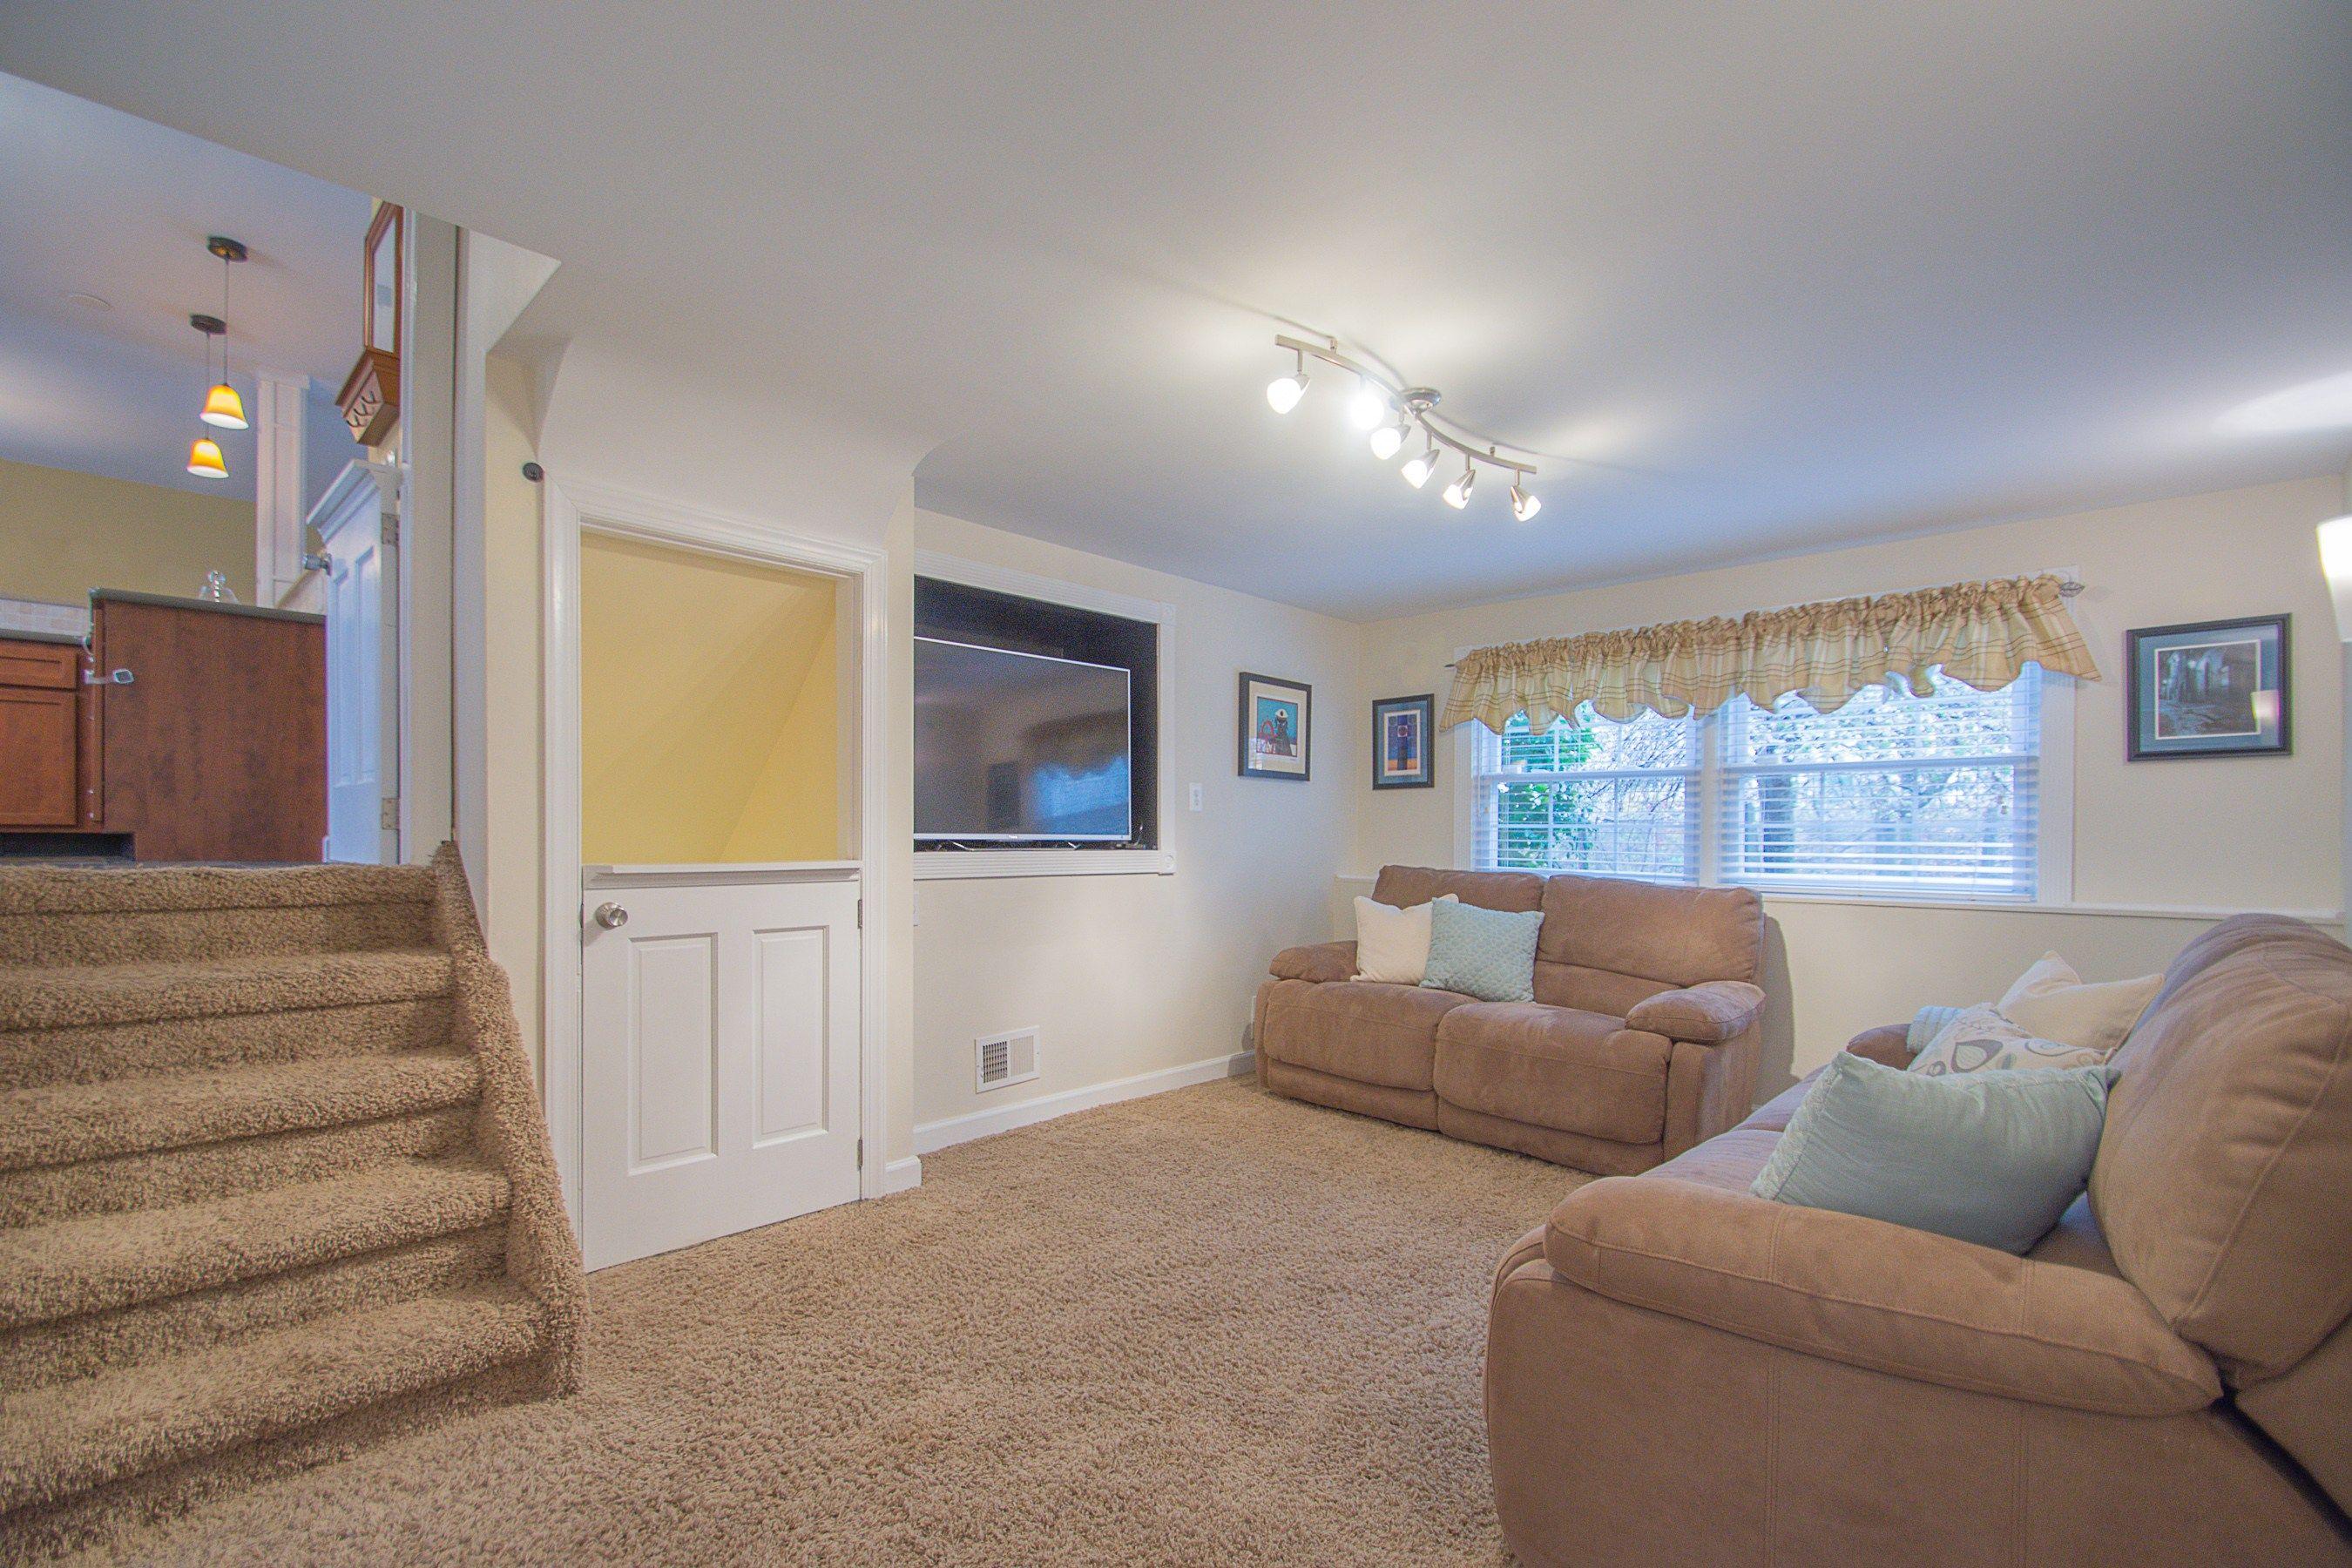 38++ Homes for sale xanadu wall nj ideas